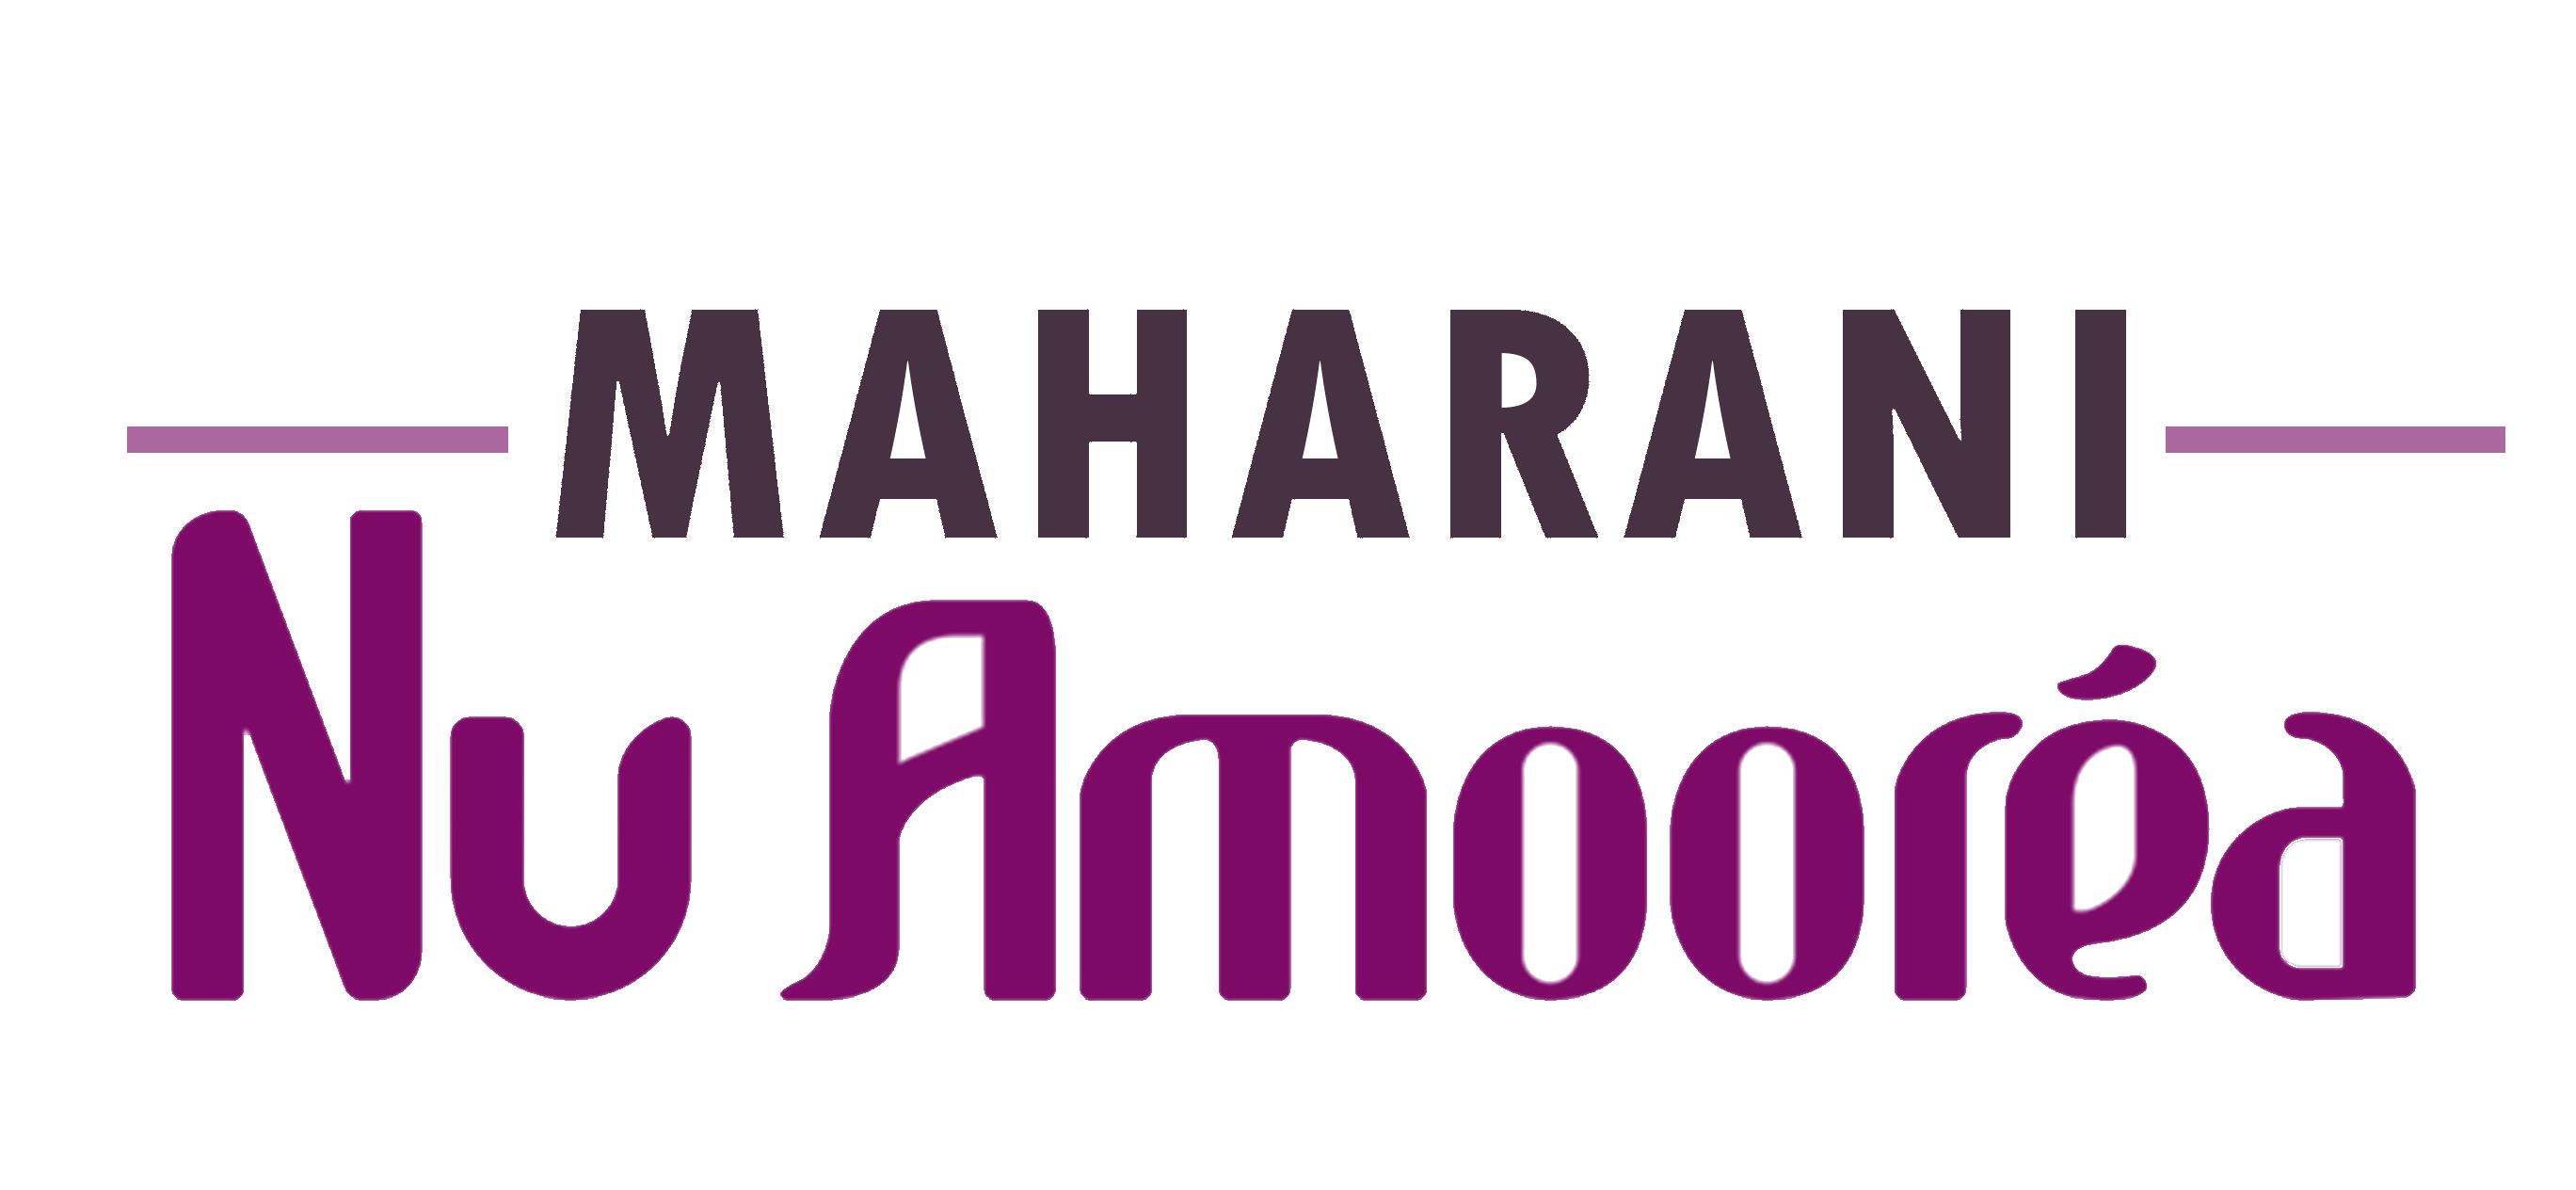 MAHARANI NuAmoorea